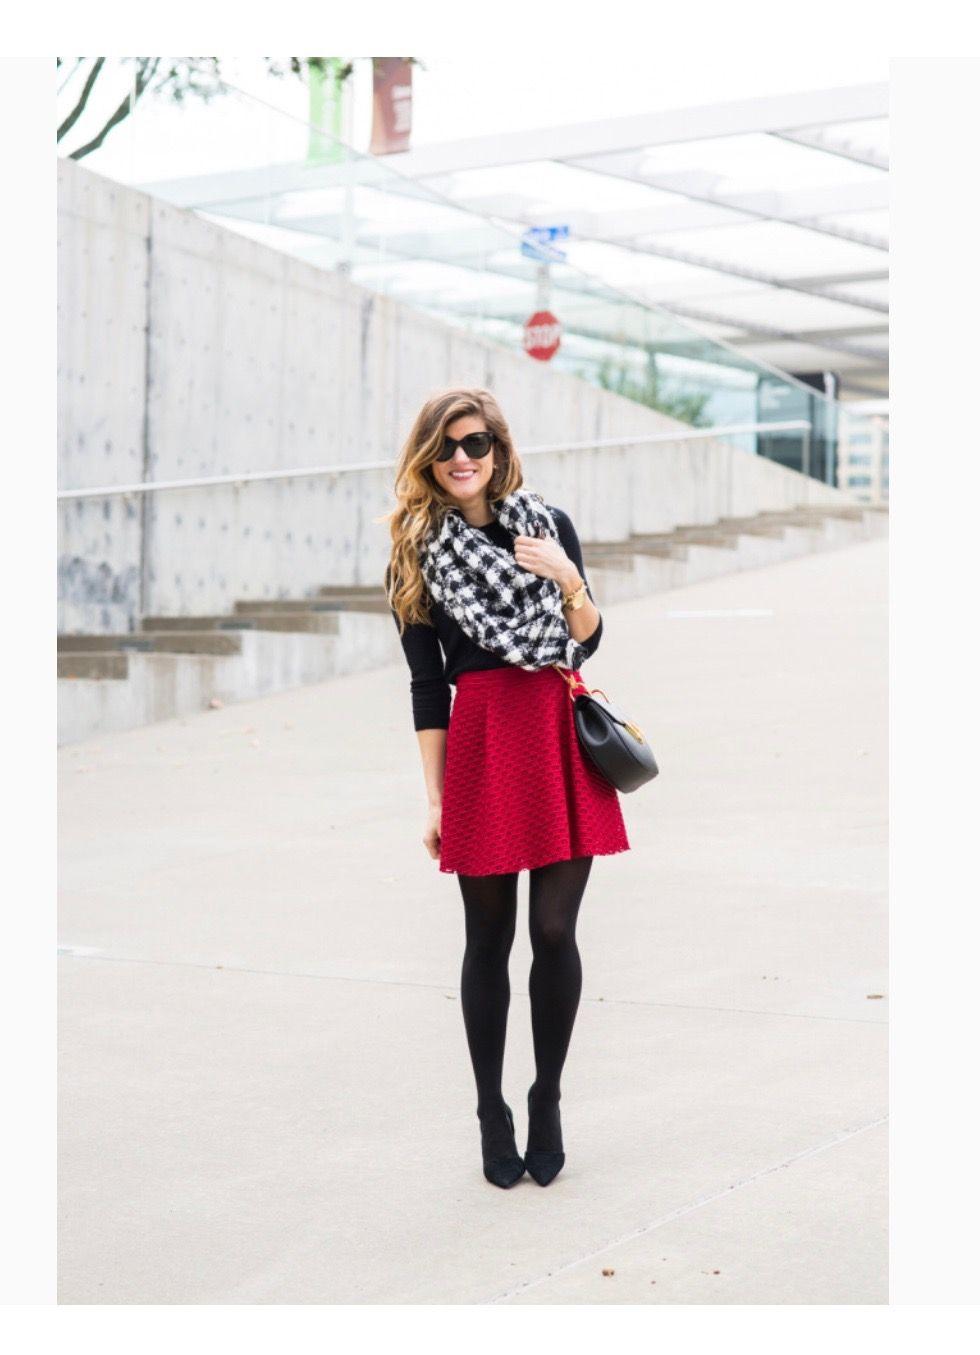 Red dress short